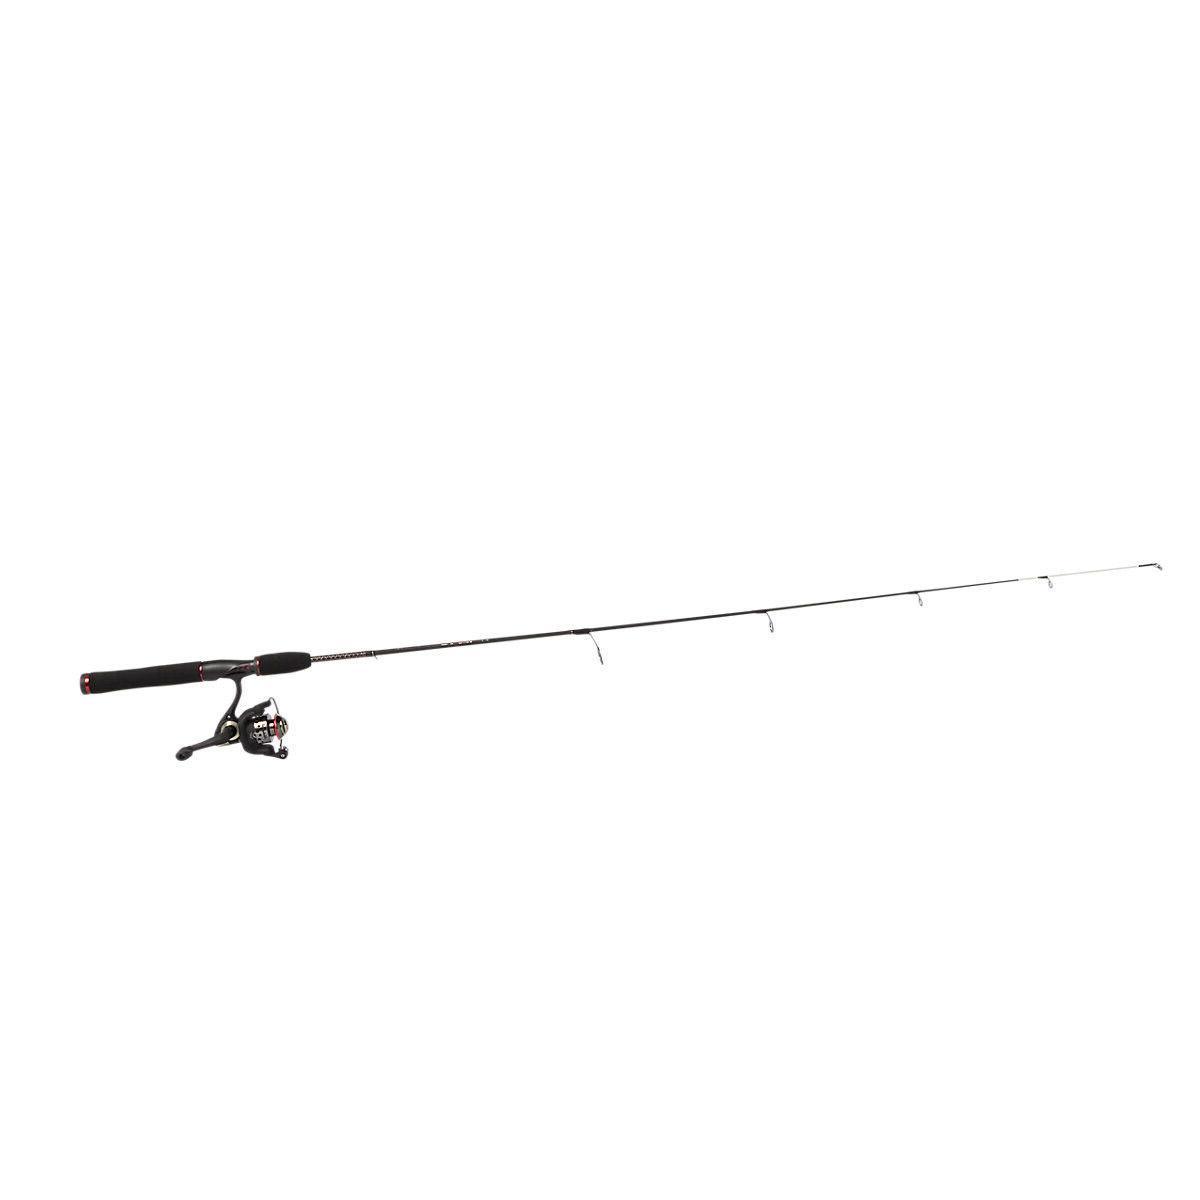 Fishing Rod Shakespeare Stik GX2 and new